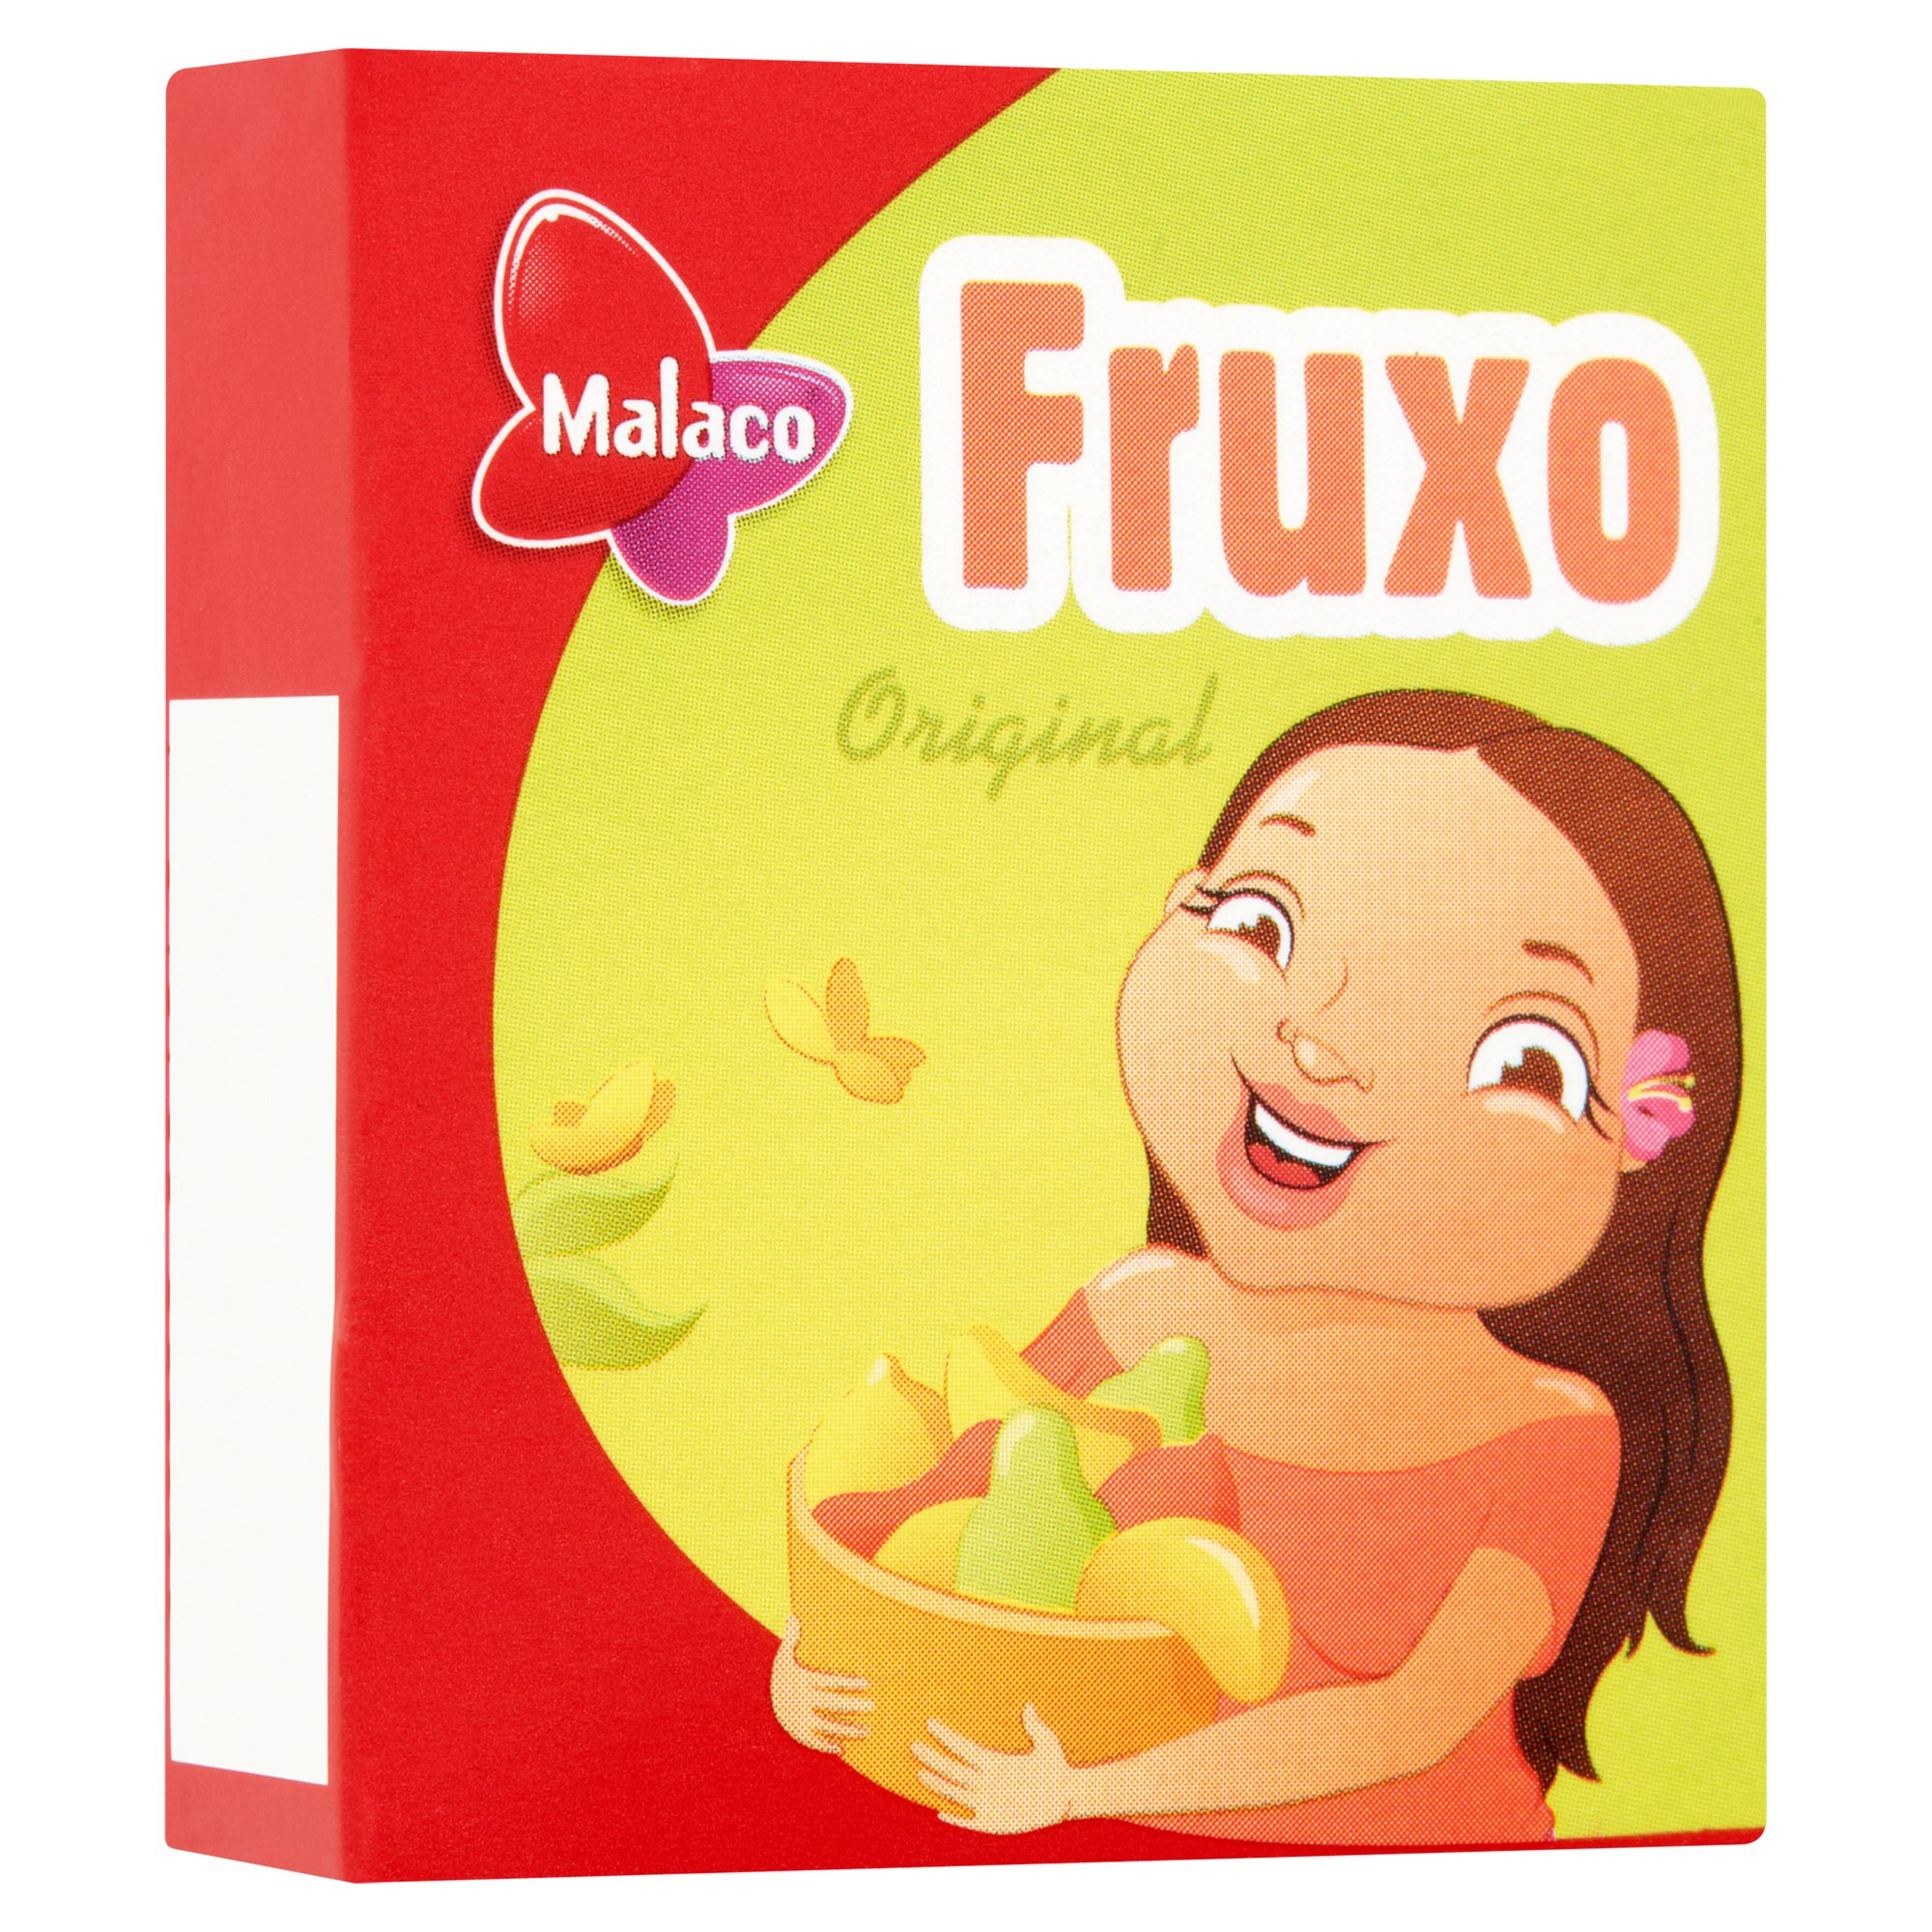 Fruxo Godisask - 19% rabatt